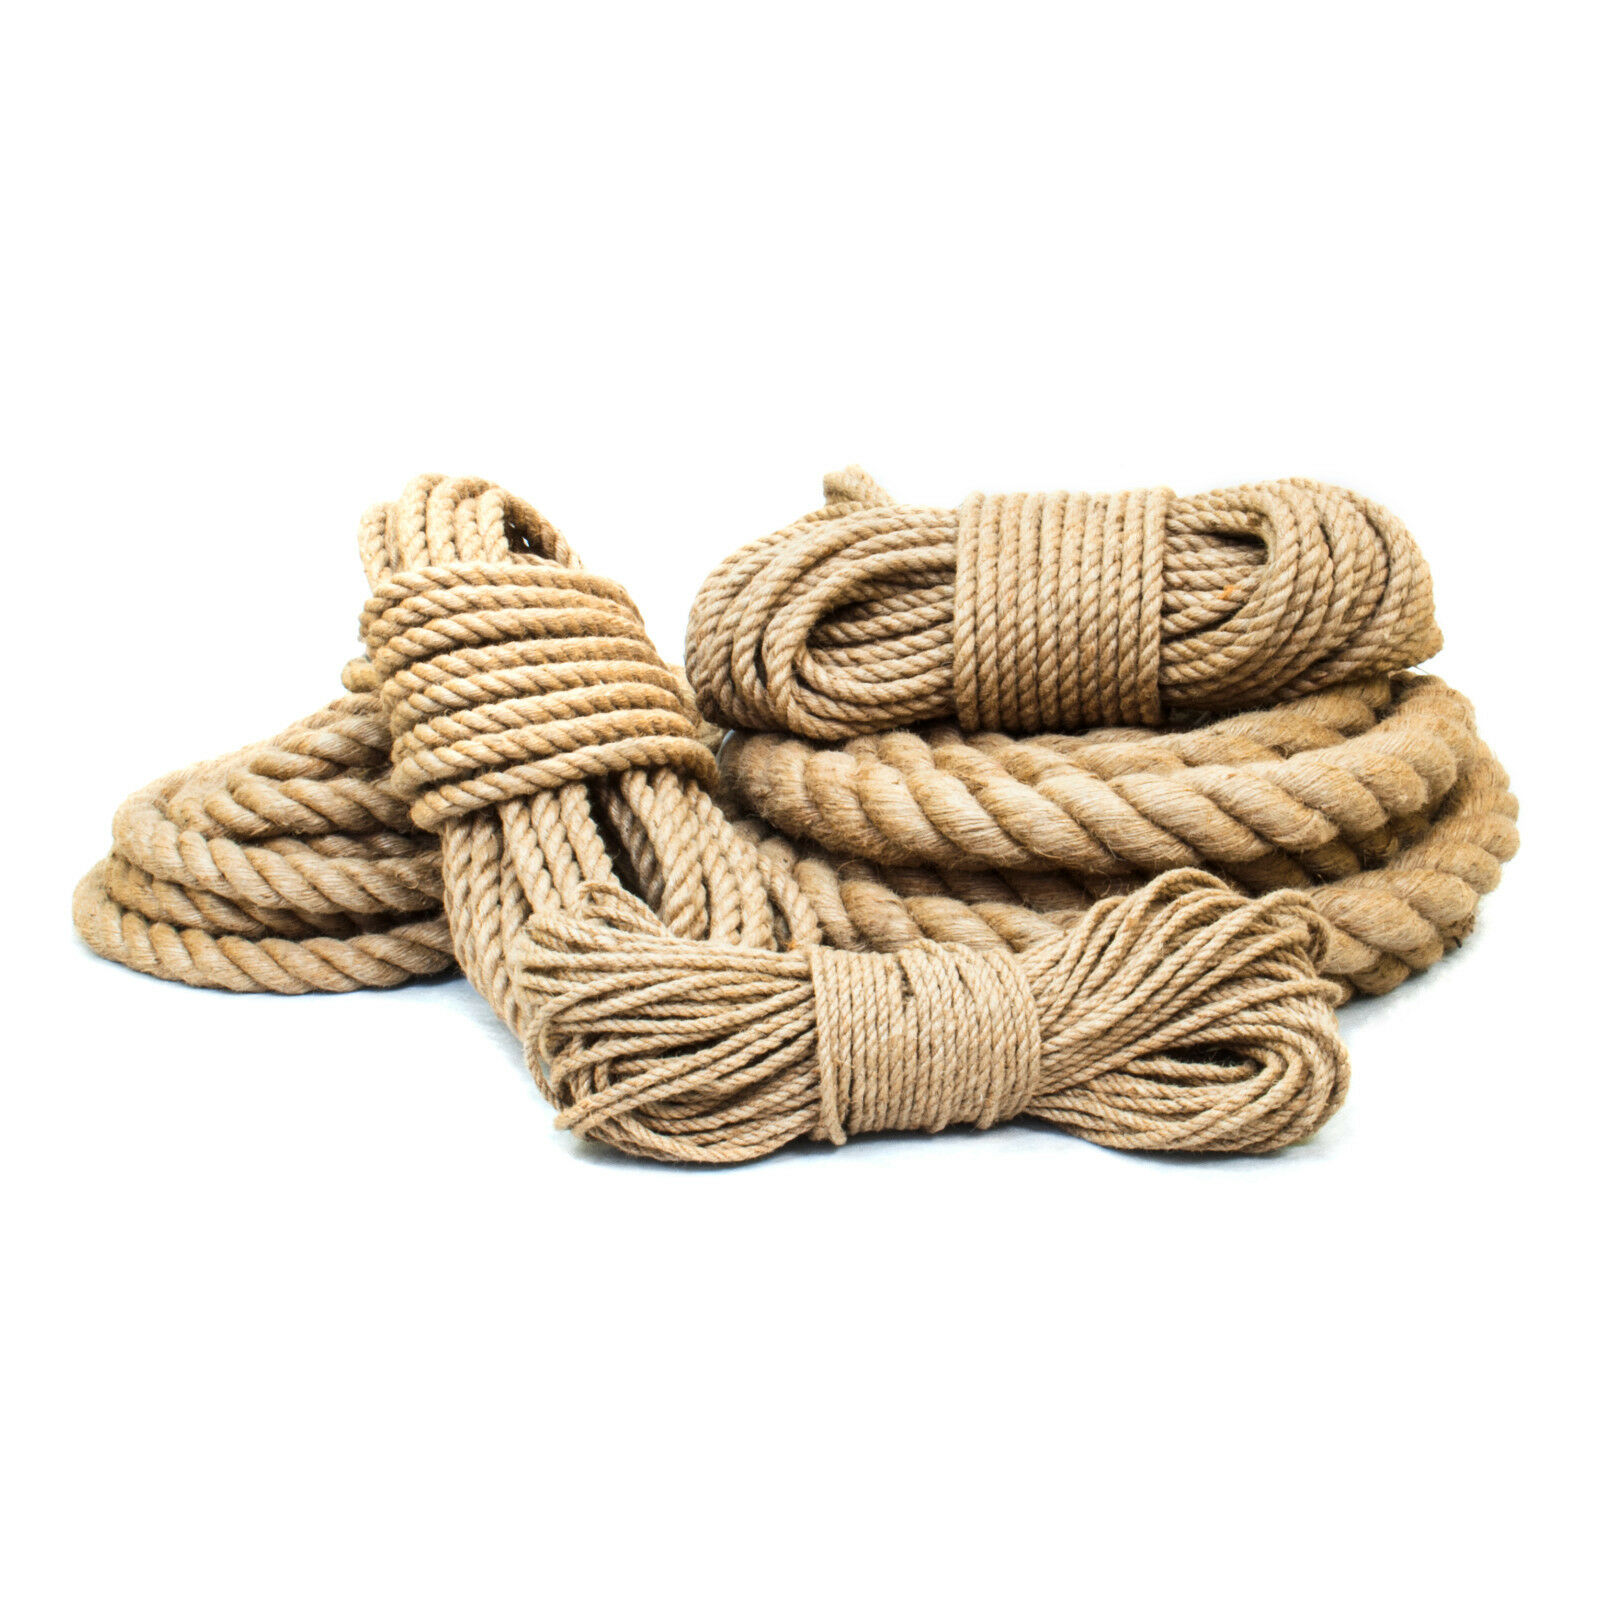 JUTESEIL 6-60mm ab Rope 5 Meter Tauseil Hanfseil Naturhanf Jute Rope ab Tauziehen ceb03e